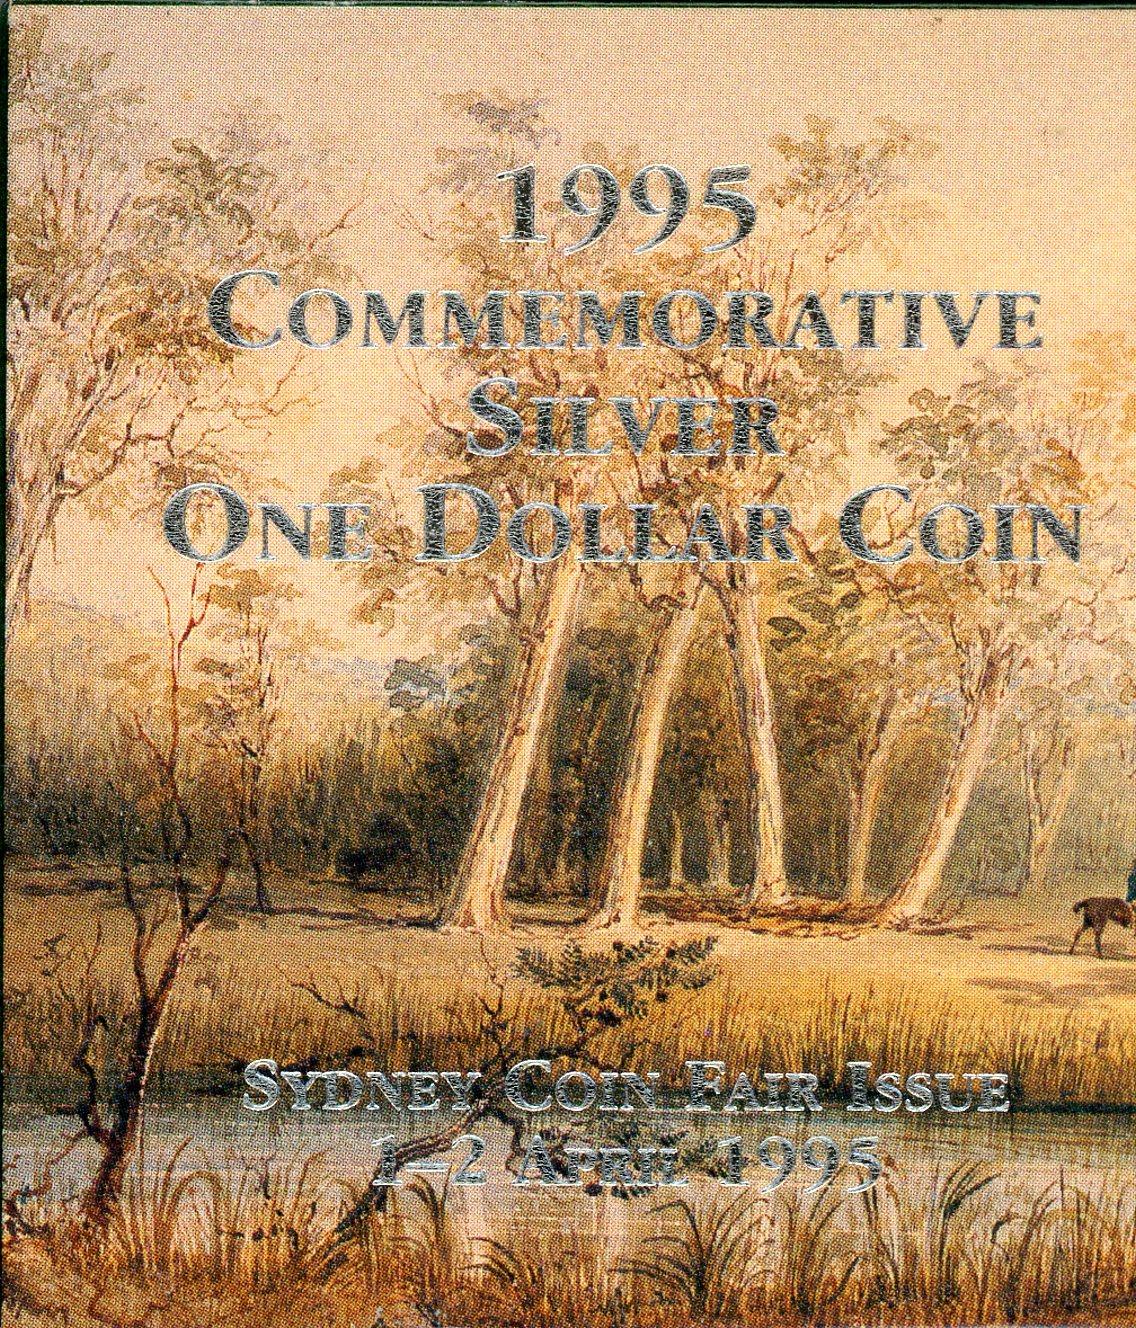 Thumbnail for 1995 Commemorative Silver Waltzing Matilda $1 Coin - Sydney Coin Fair 1-2 April 1995